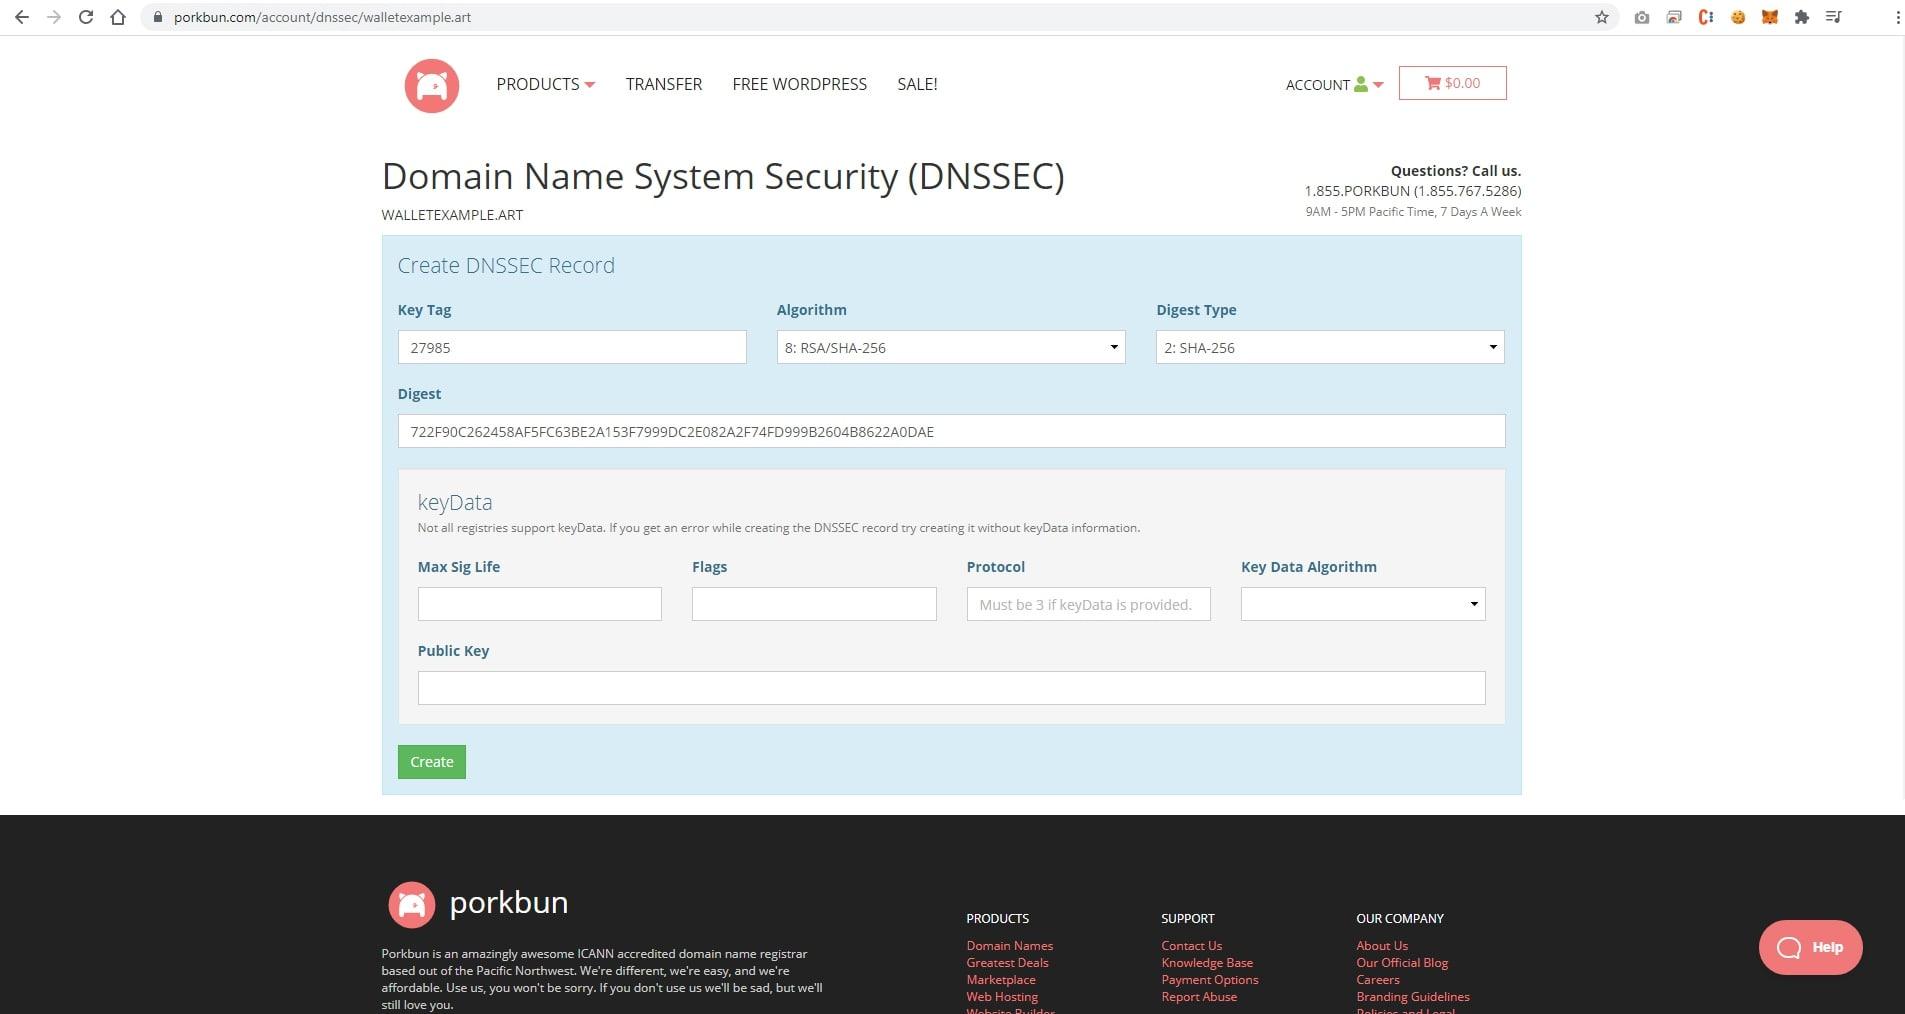 DNSSEC form